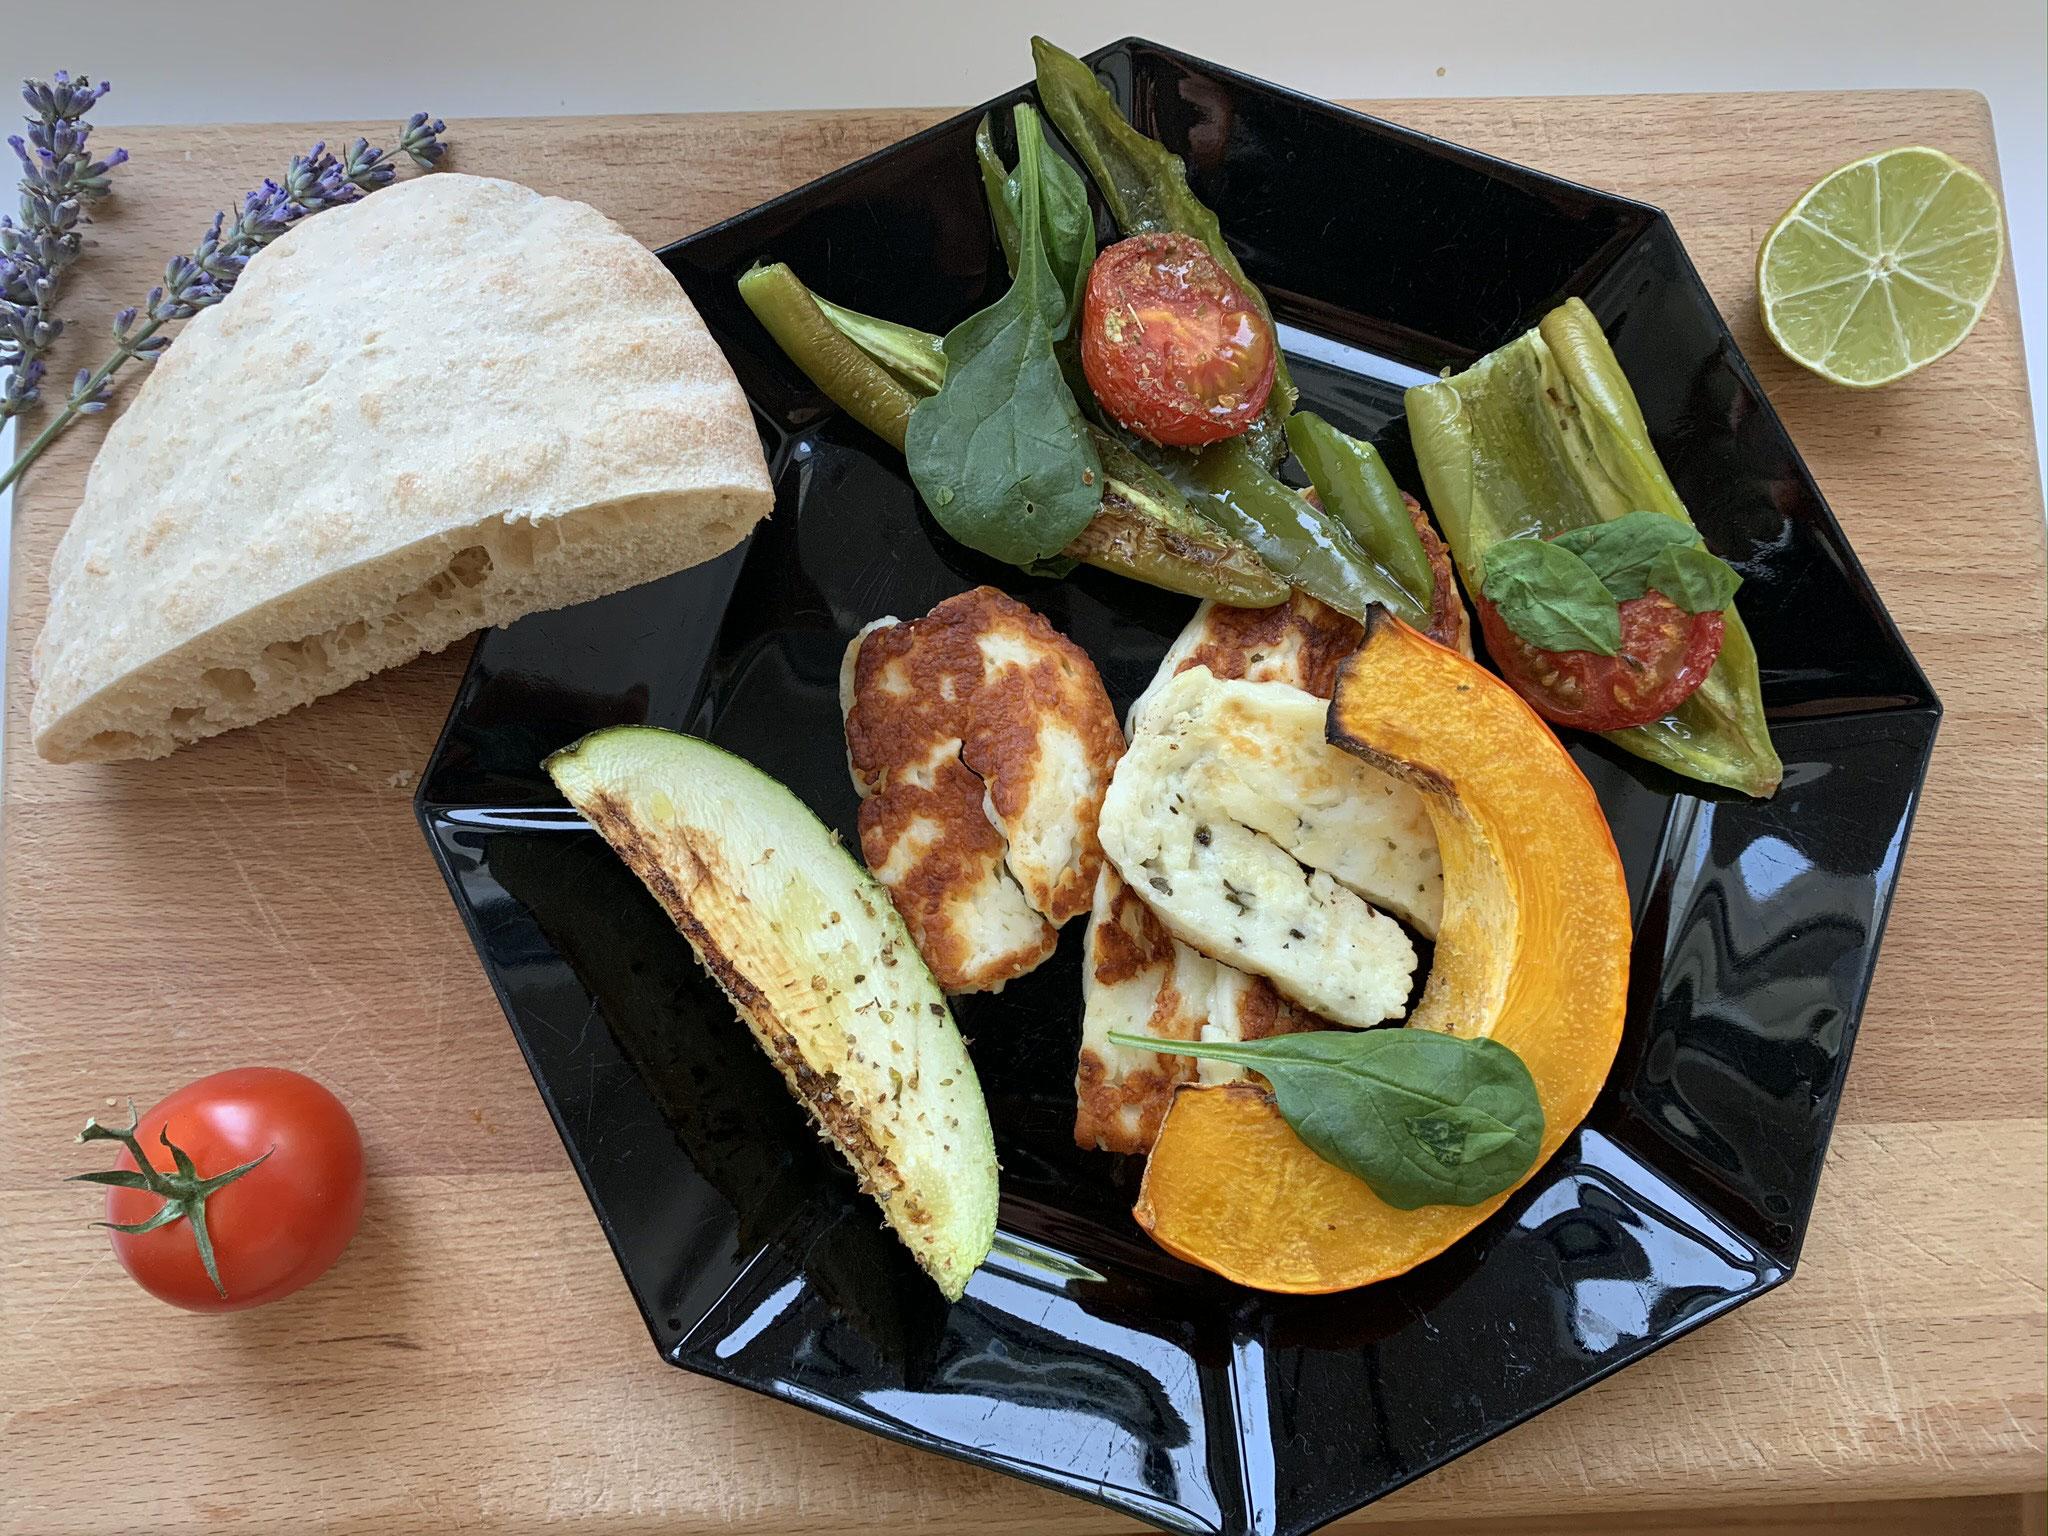 Halloumi mit Ofengemüse und Pita-Brot